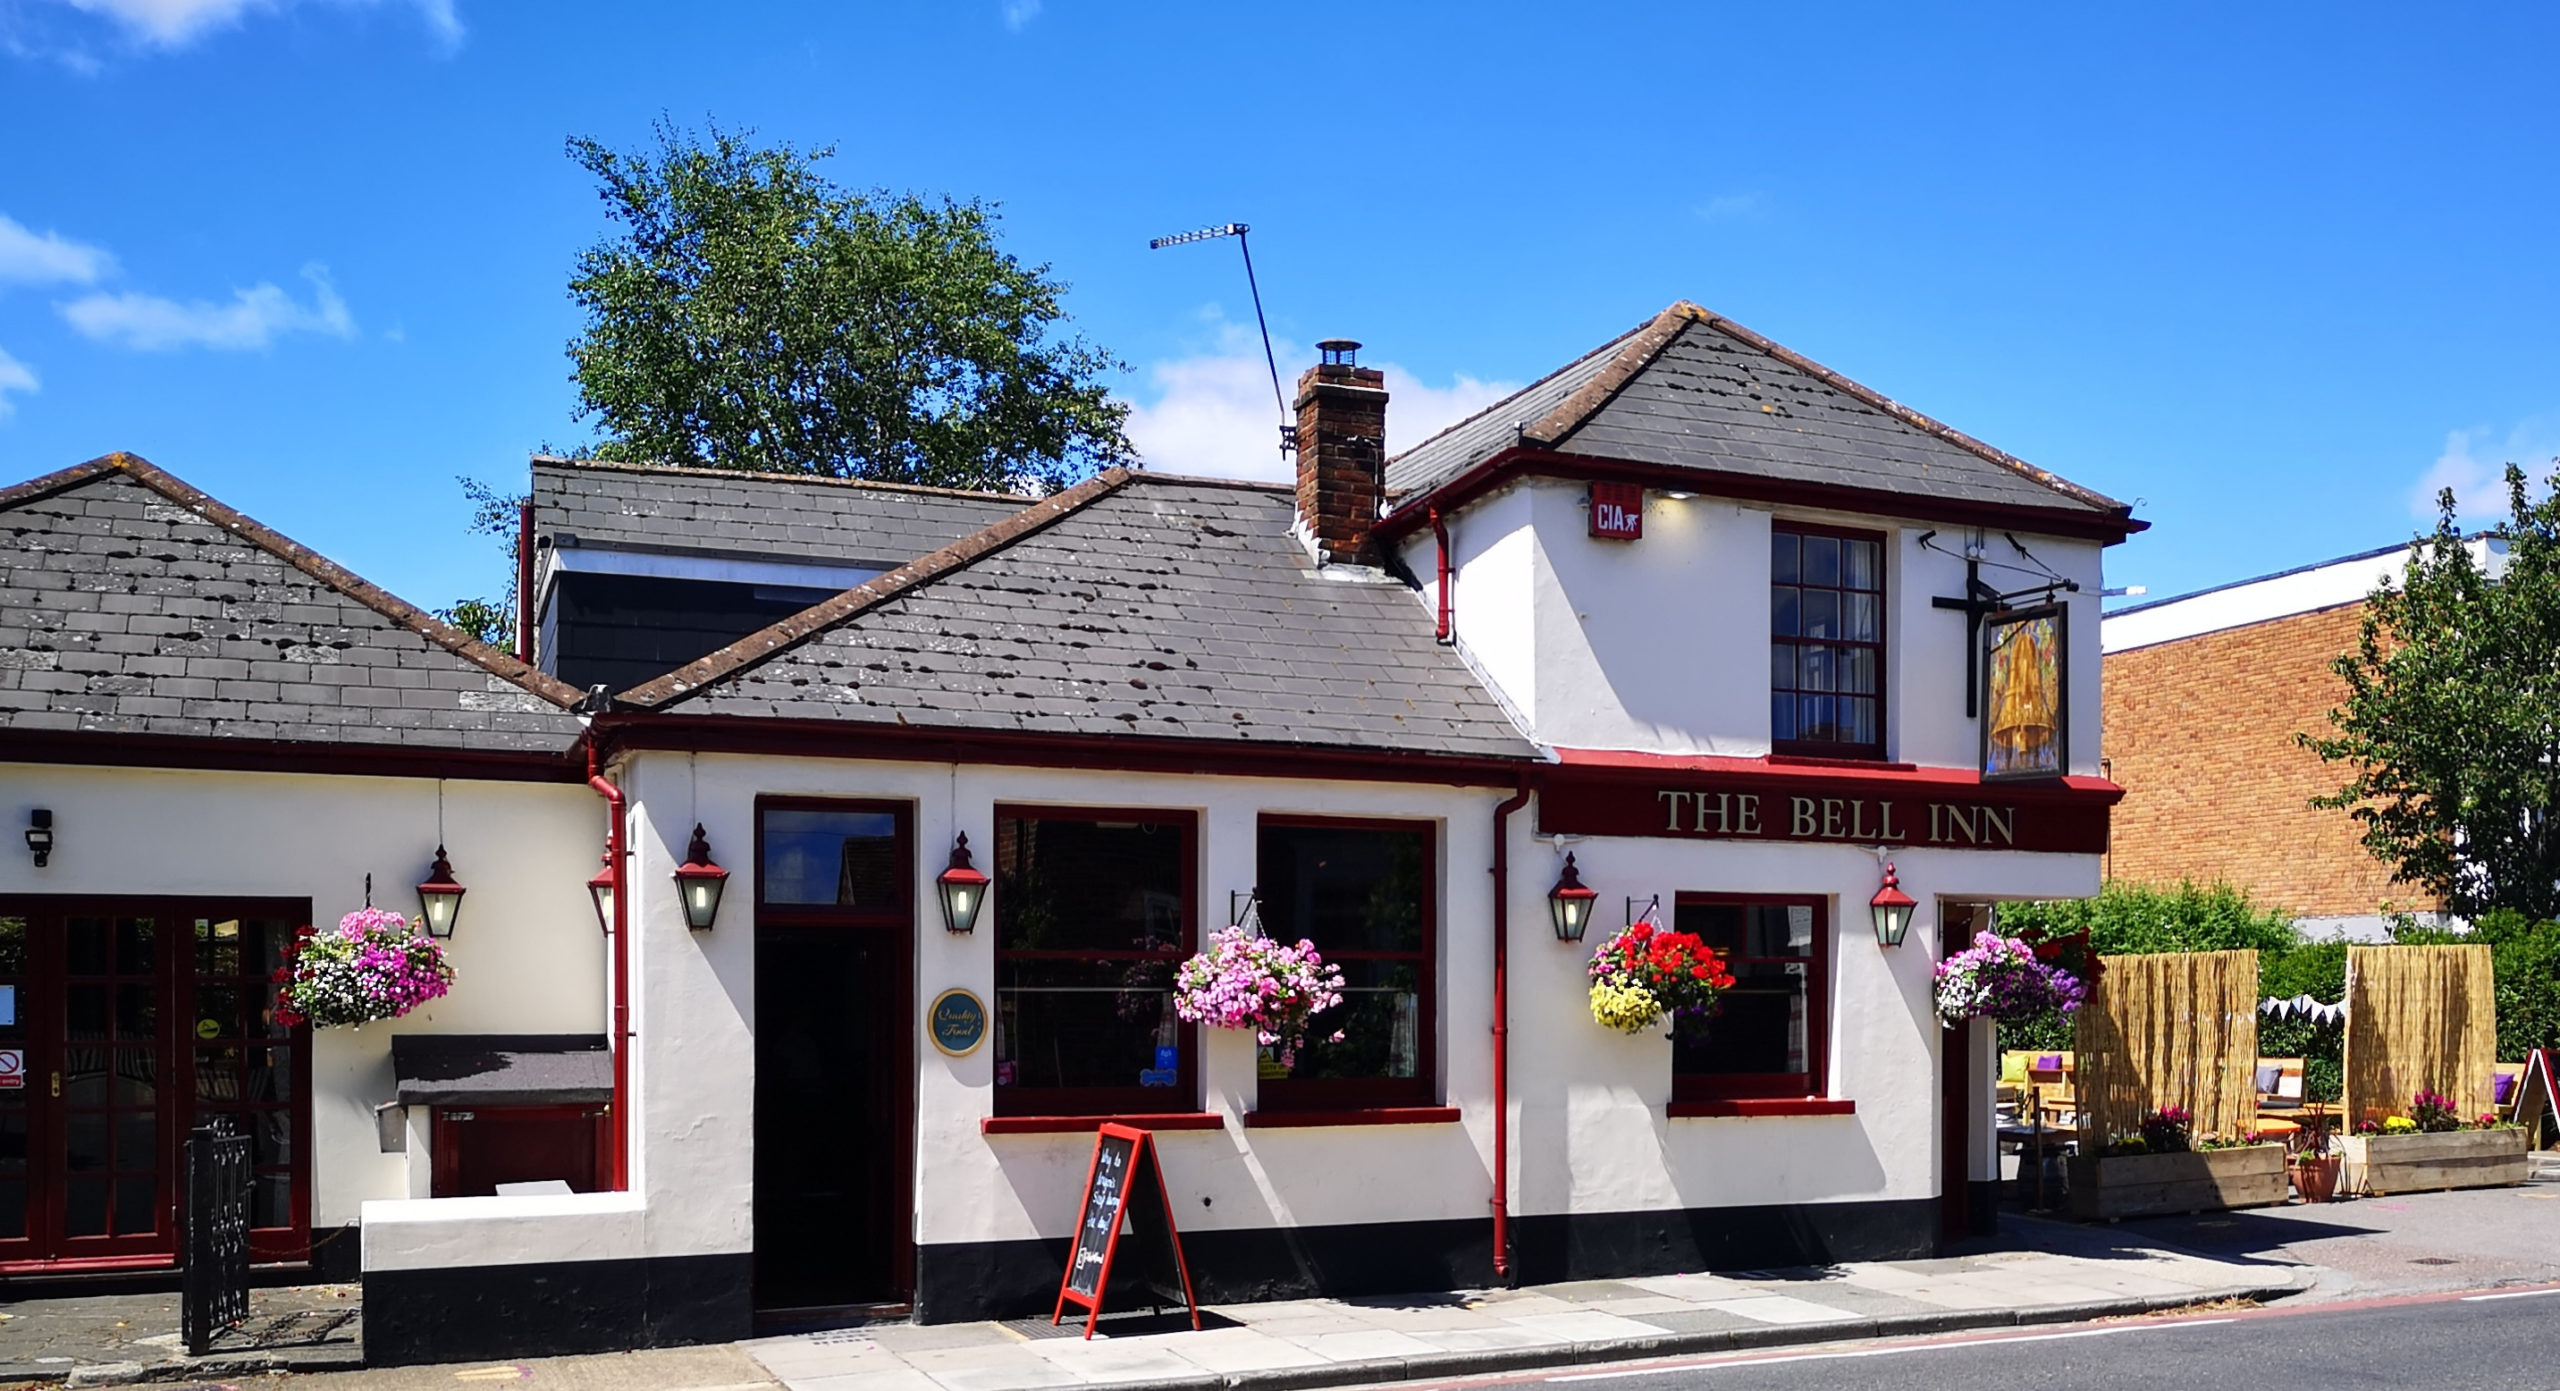 The Bell Inn, Chichester